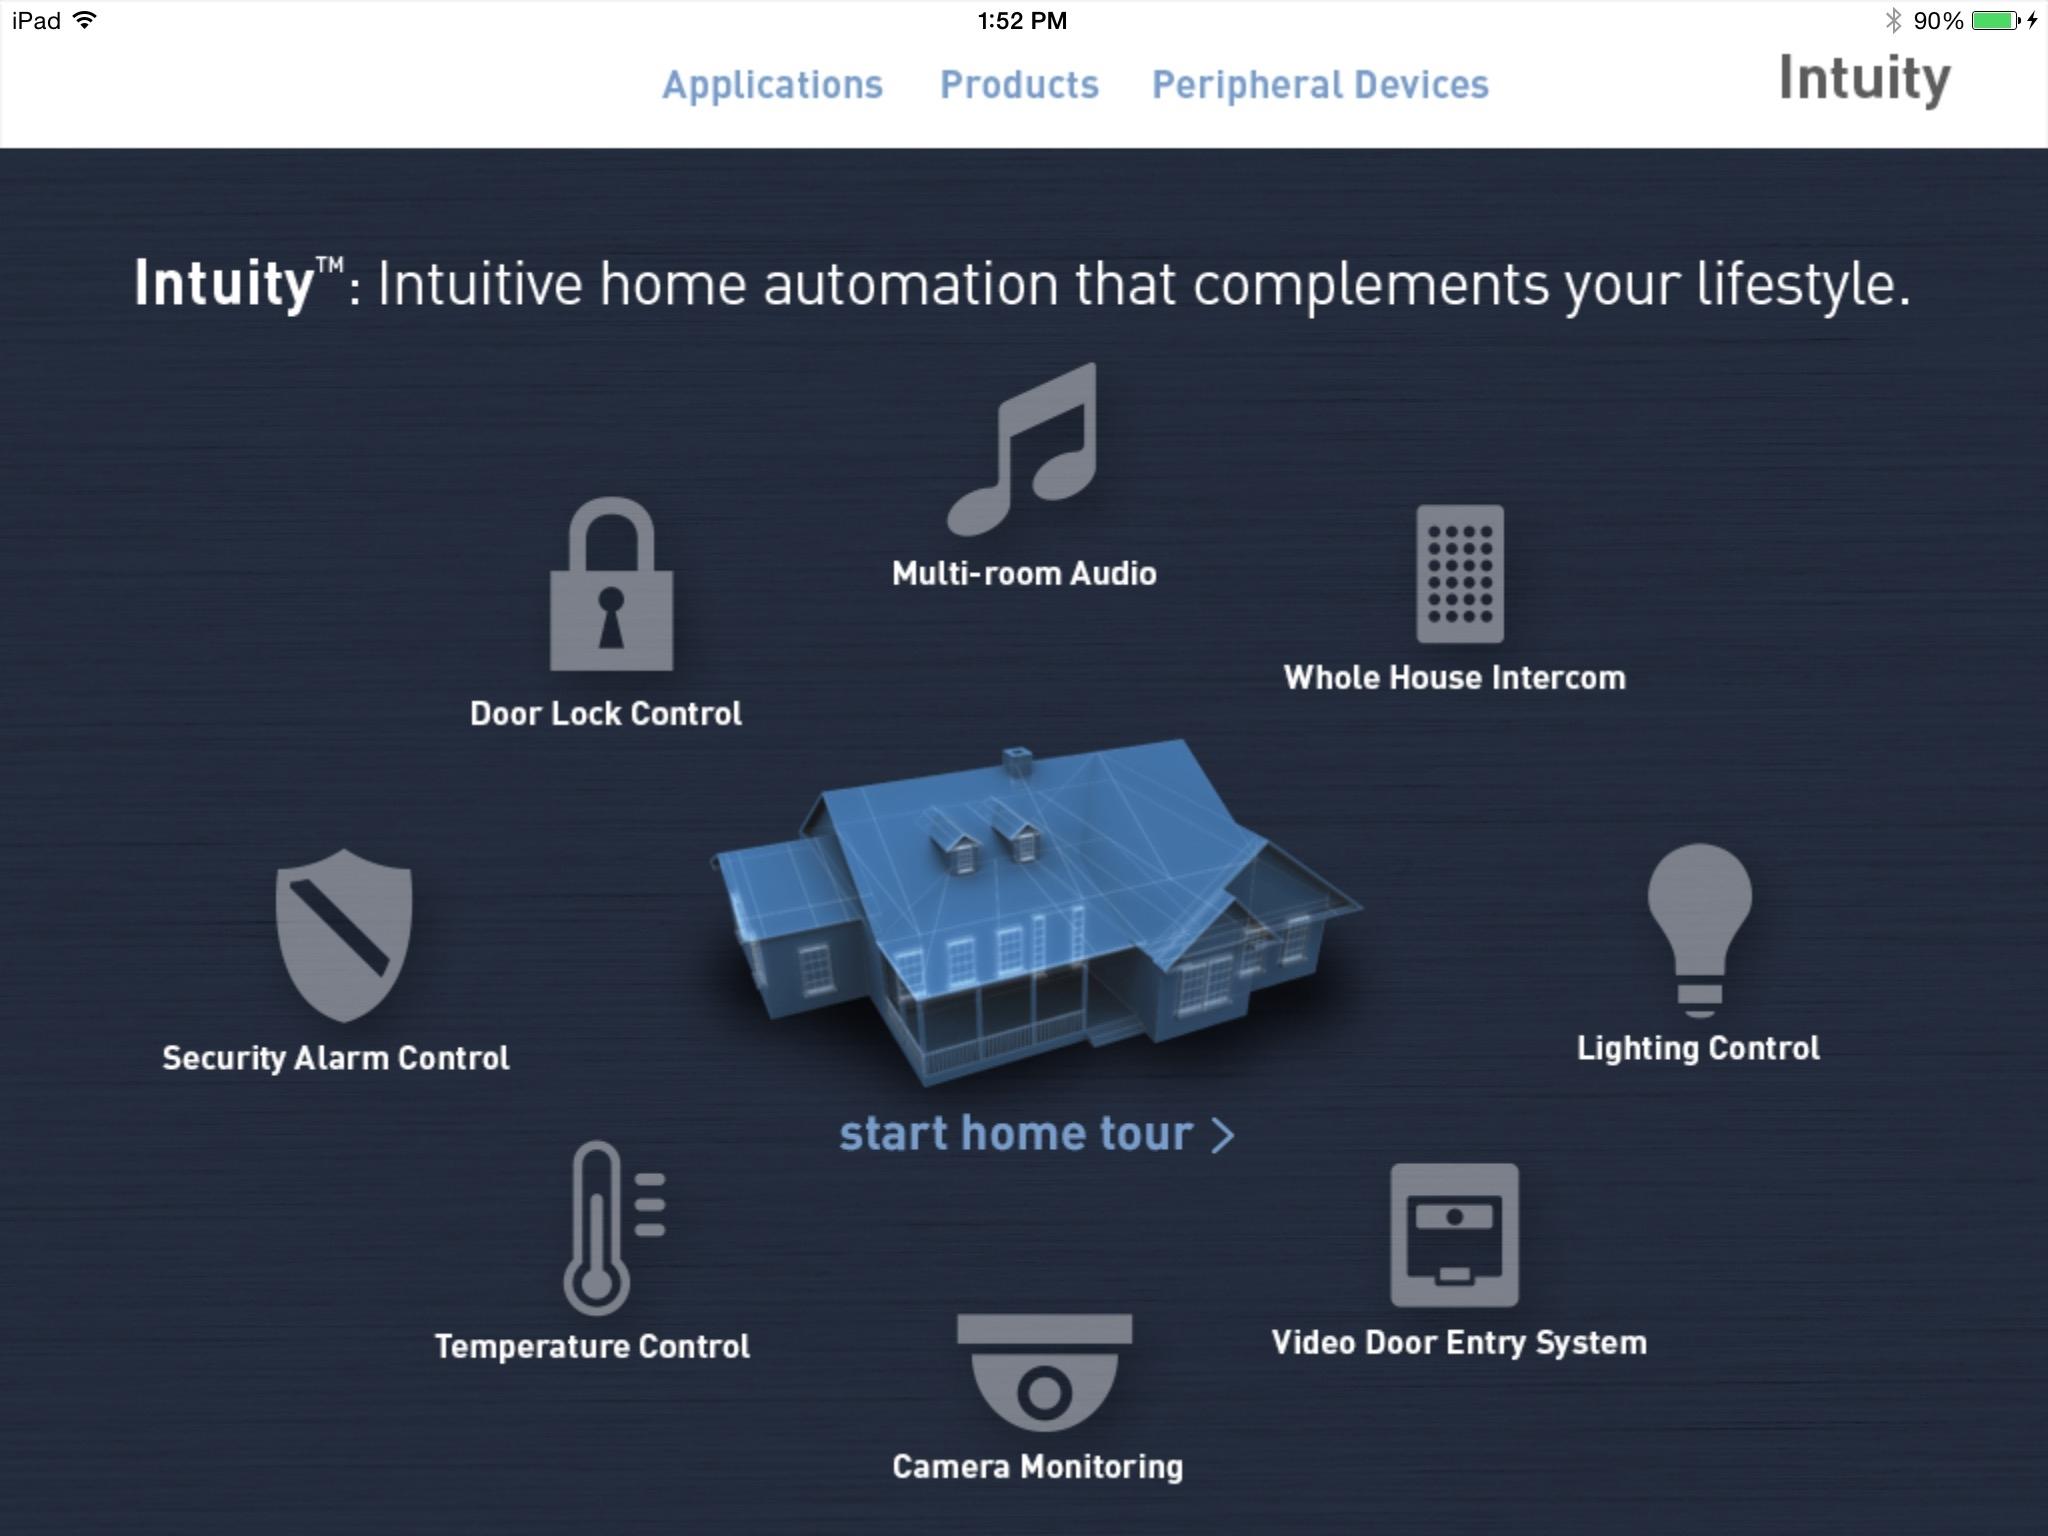 St louis digital marketing agency web design web - Web application home page design ...